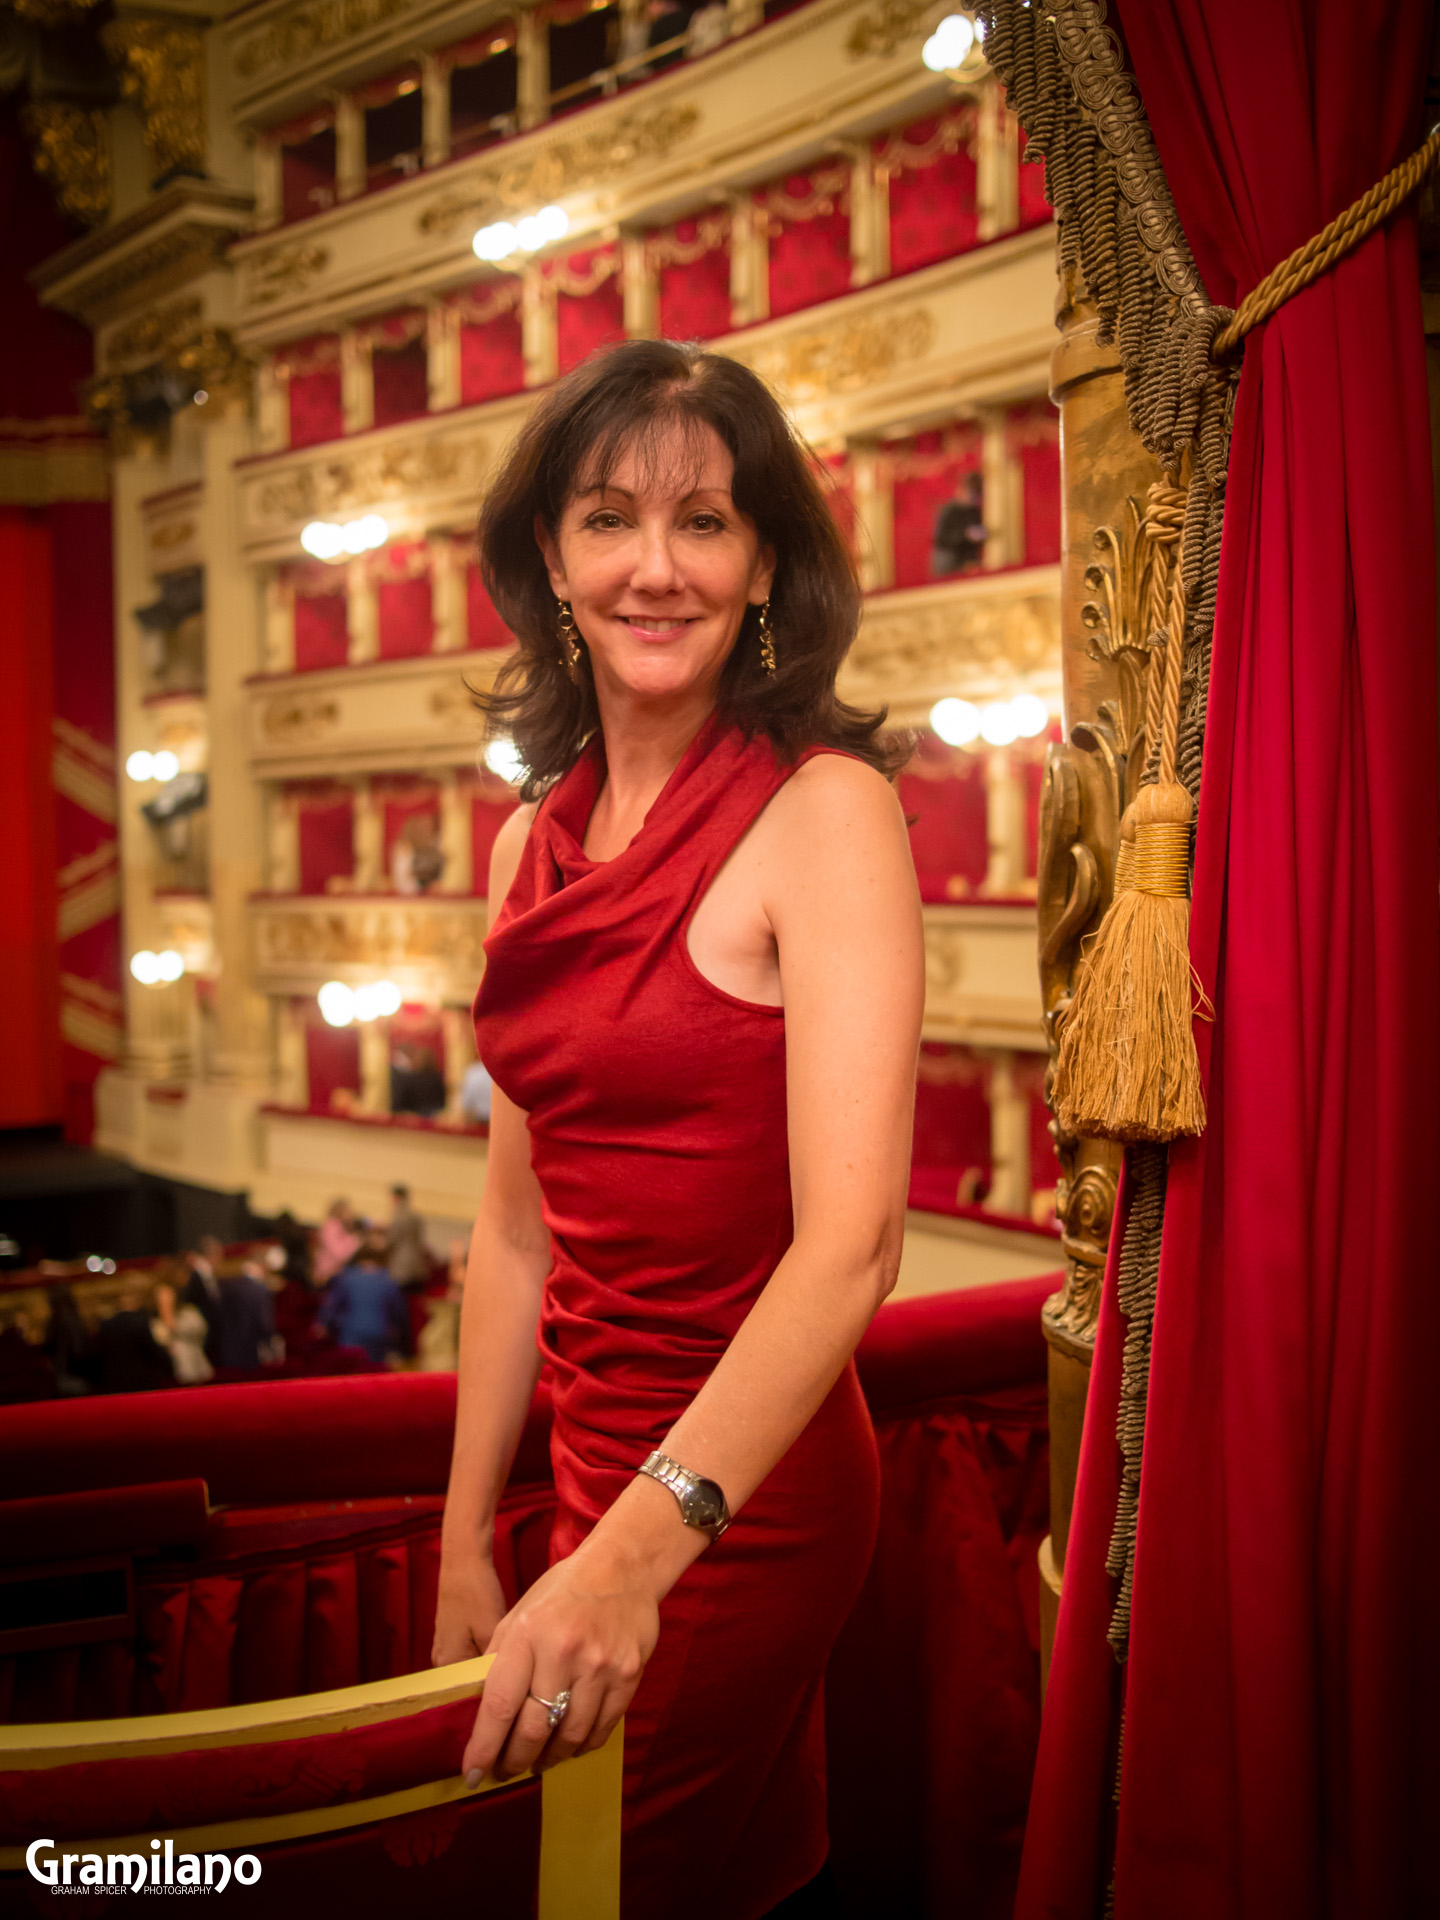 Cynthia Harvey (American Ballet Theatre - The Royal Ballet)